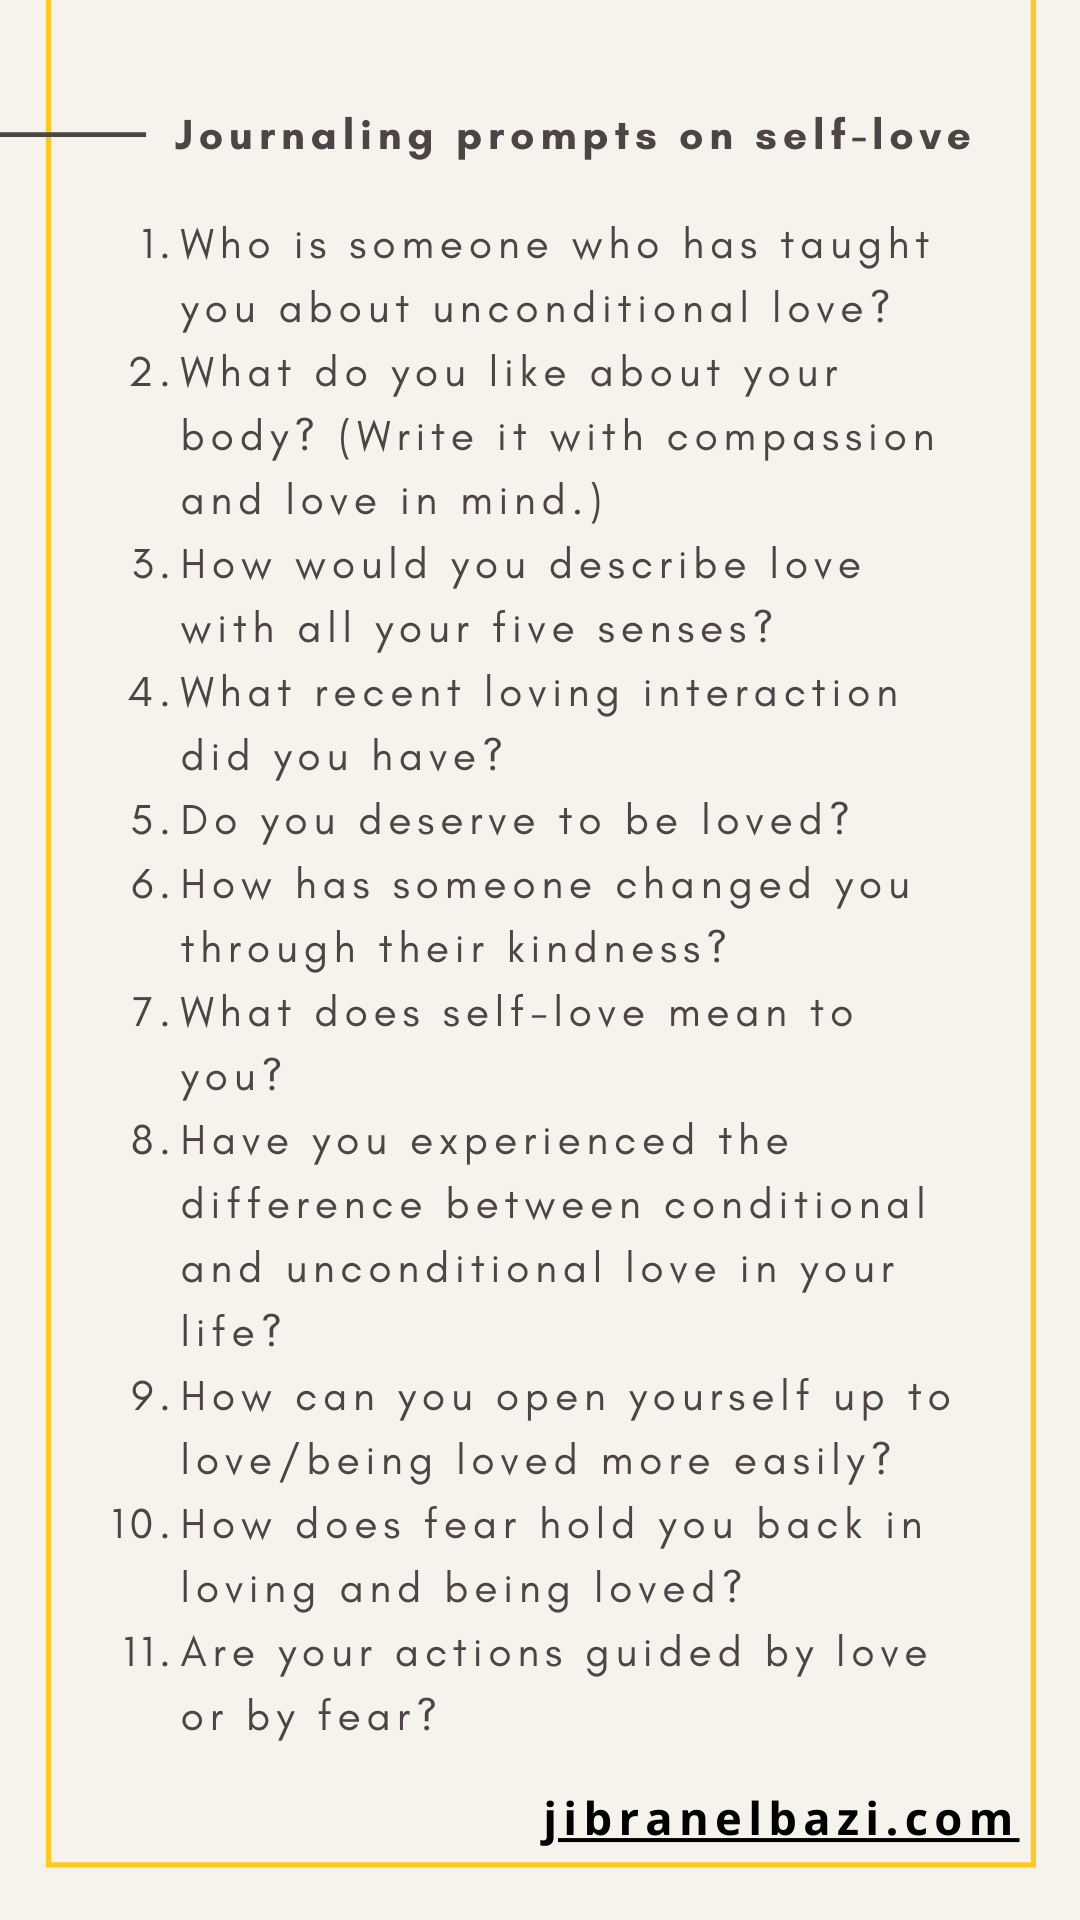 journaling prompts on self-love from jibranelbazi.com